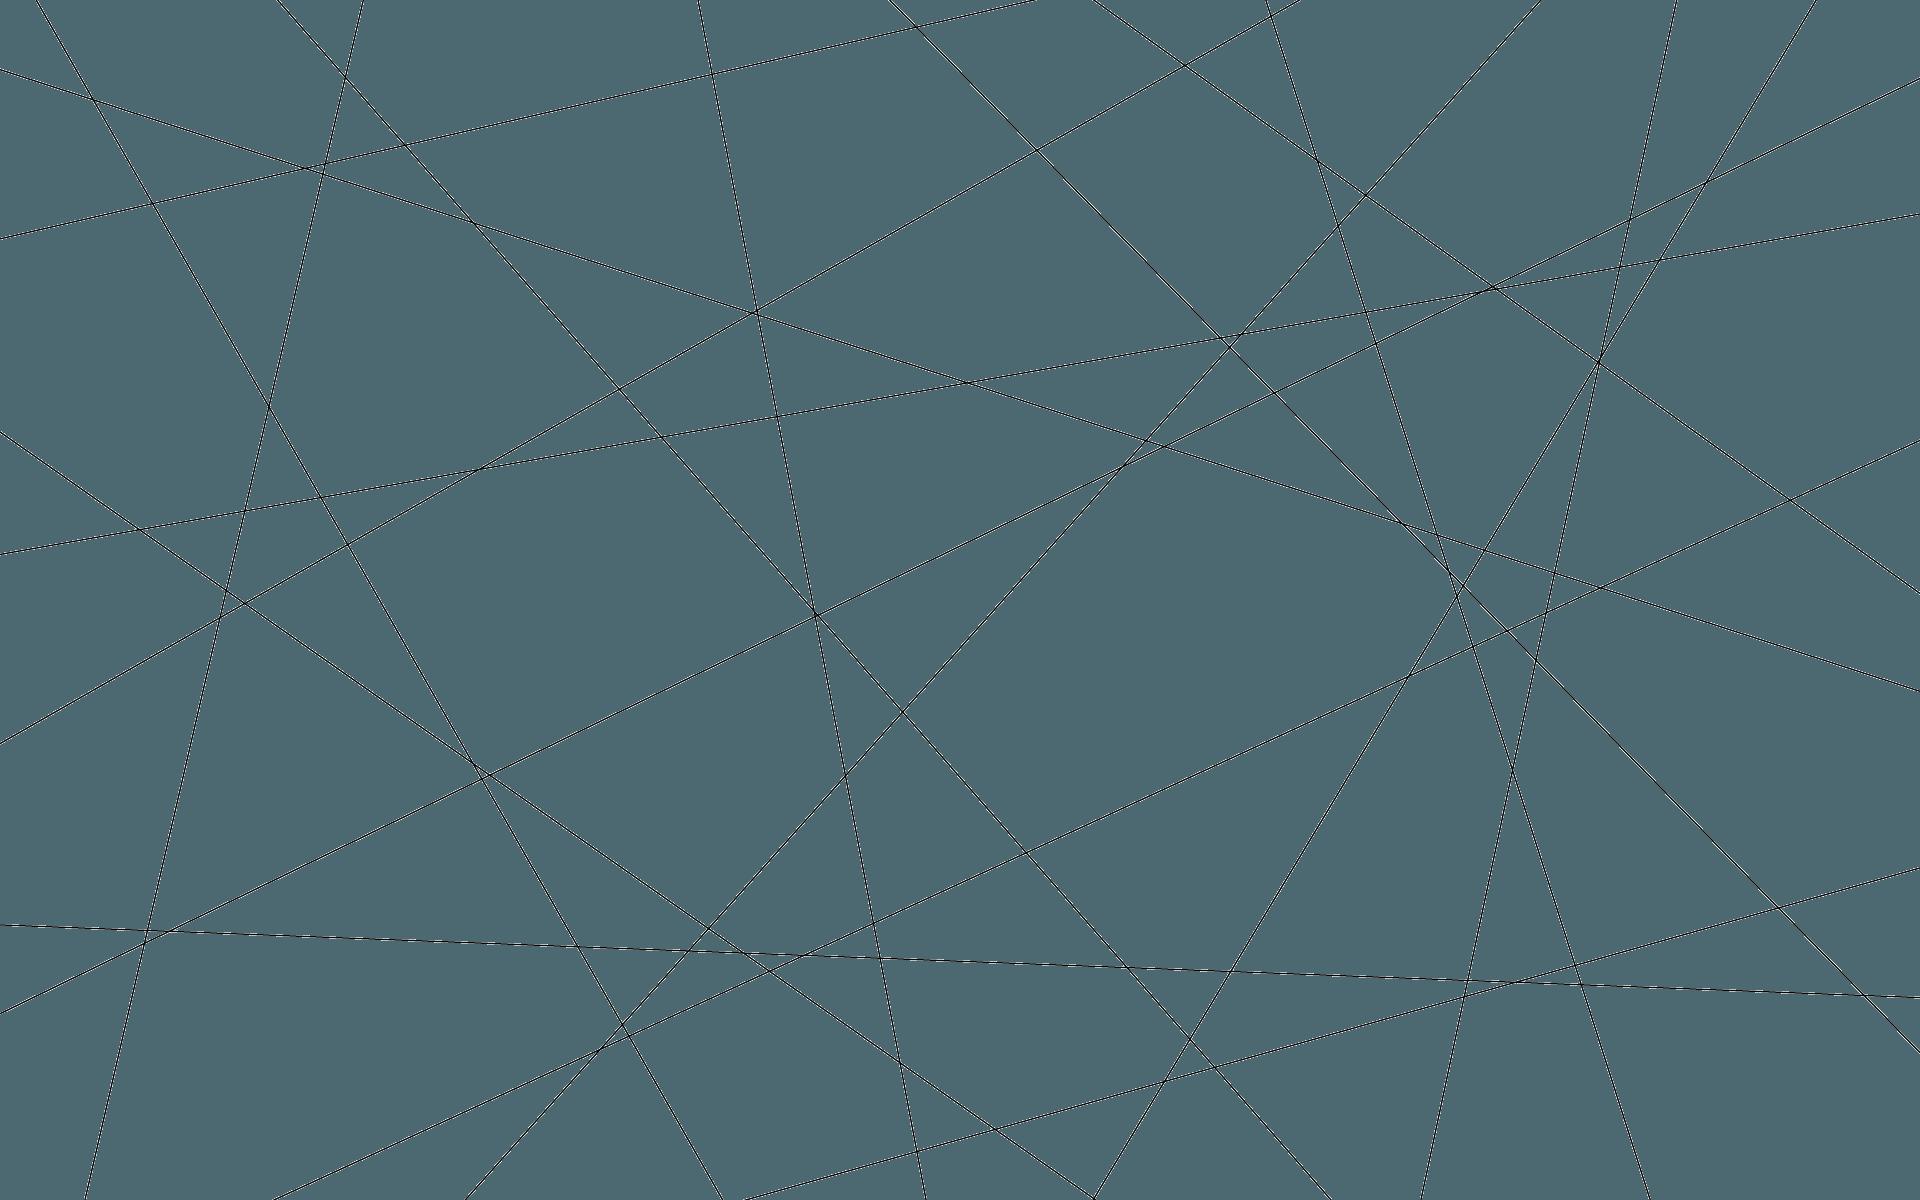 Minimalist Tumblr Pc Wallpapers Wallpaper Cave